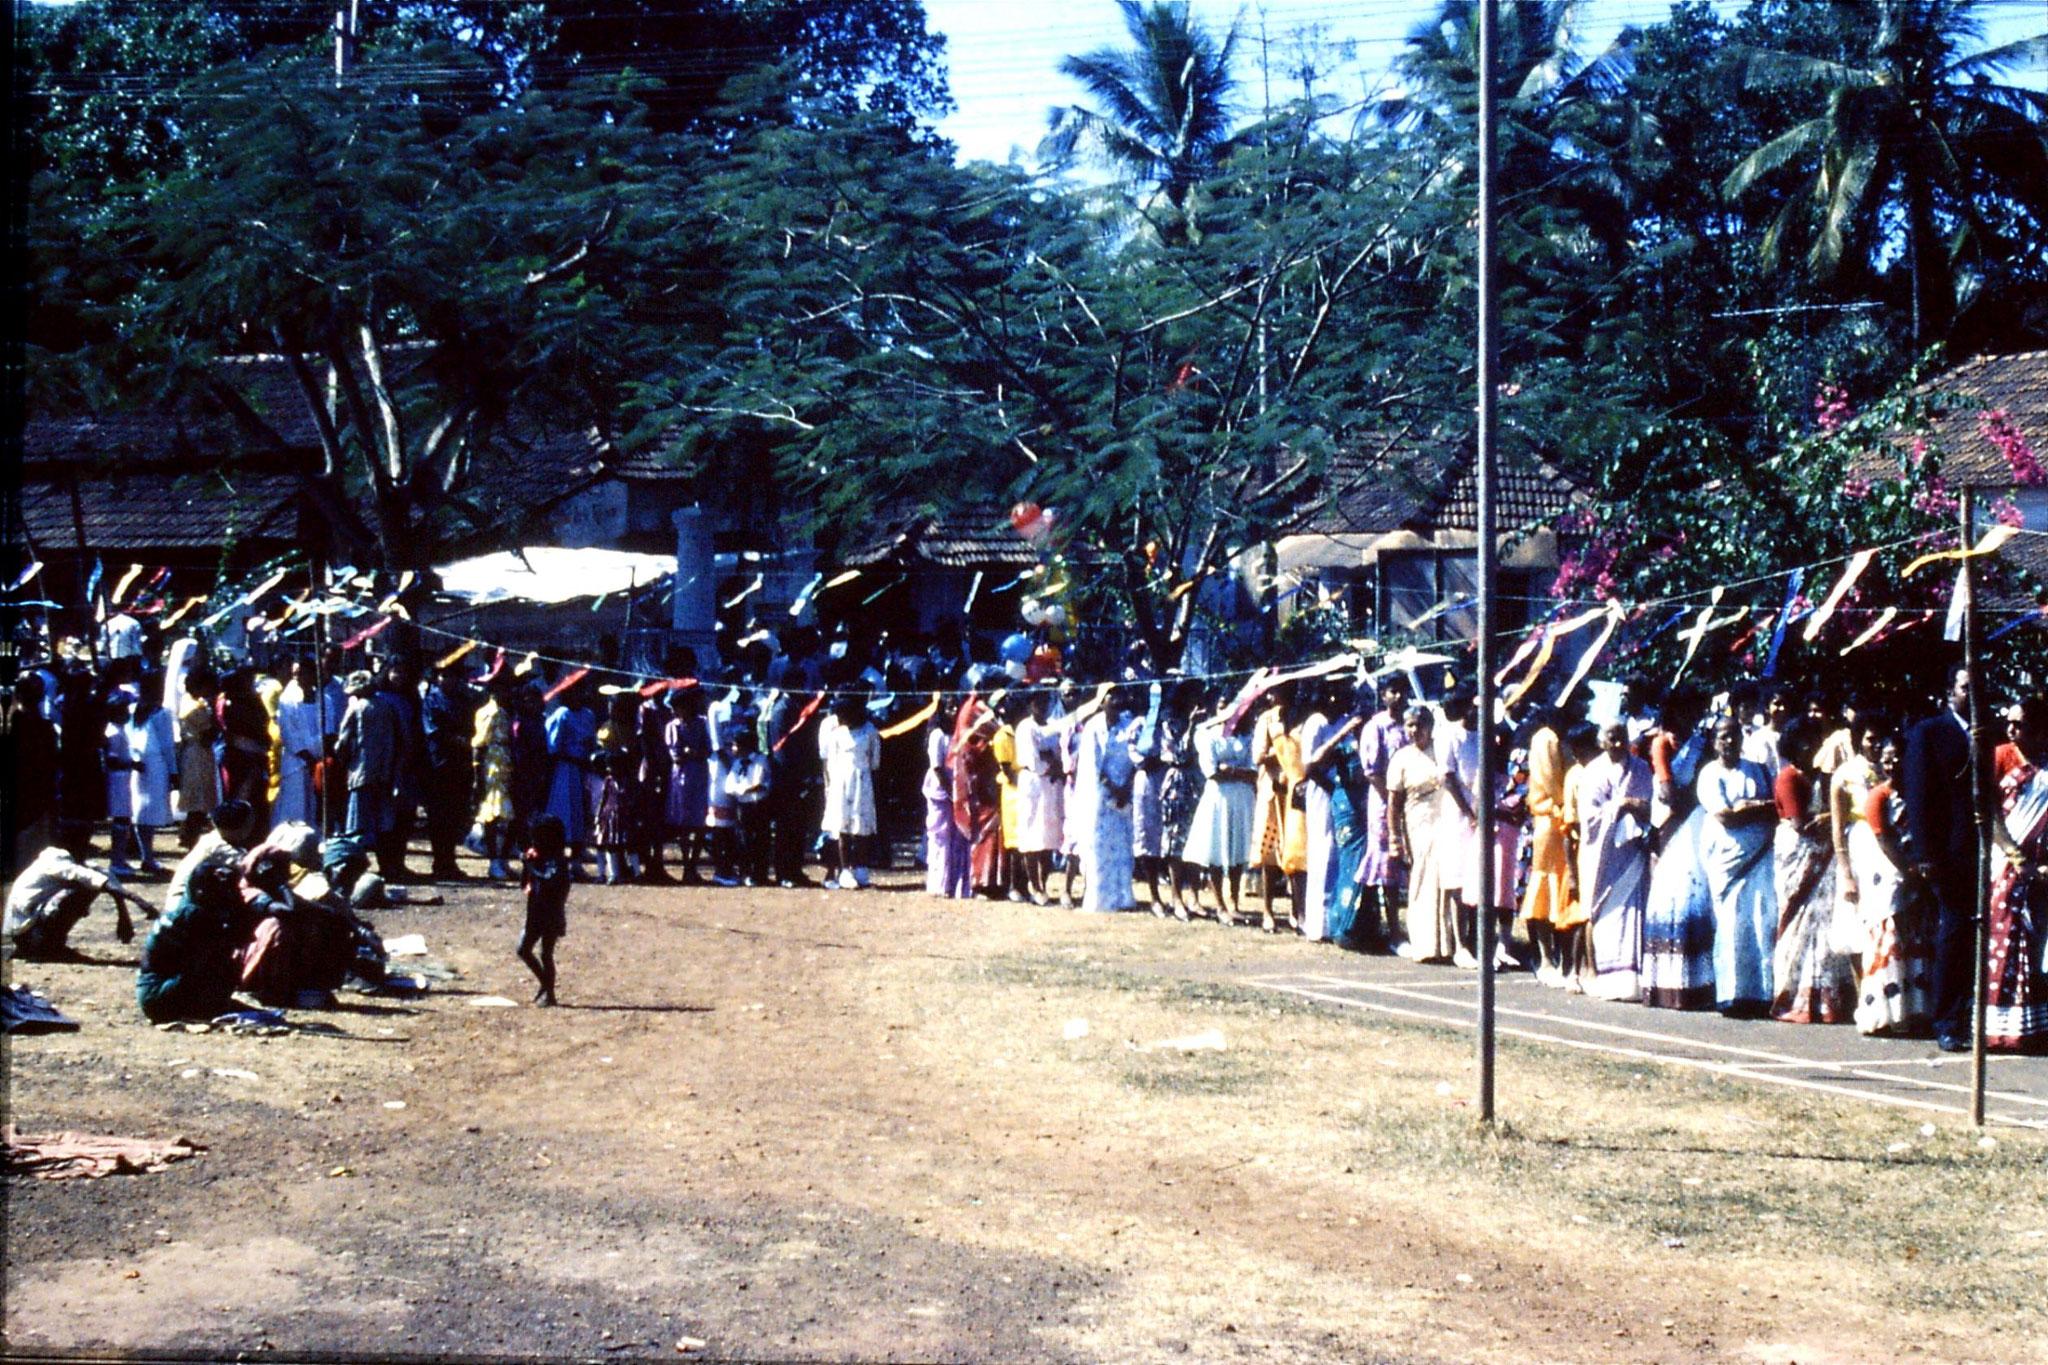 31/12/1989: 13: Siolim church and 10.30 mass procession